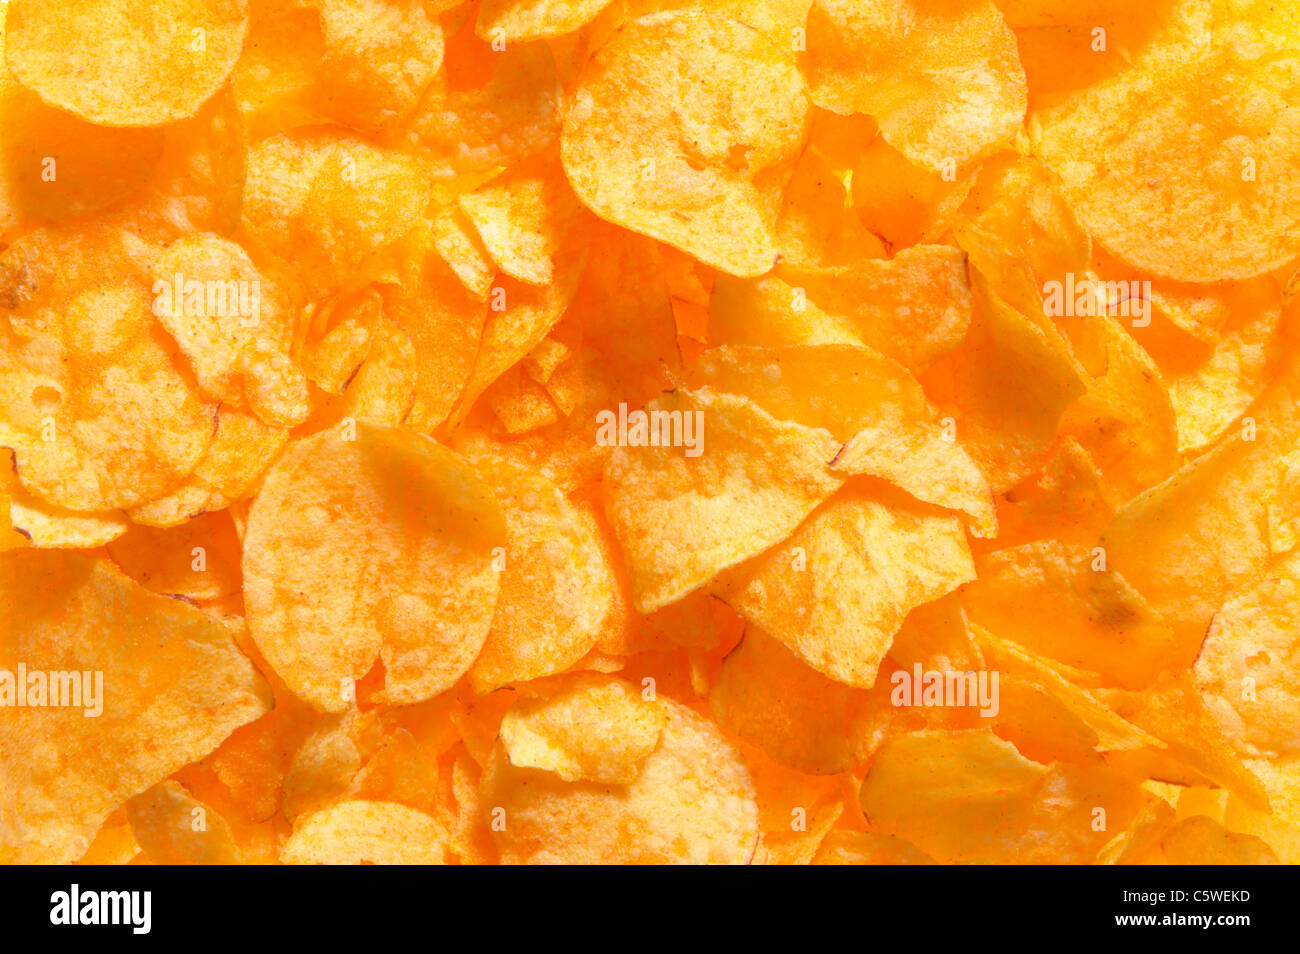 Batata chips, full frame, close-up Imagens de Stock